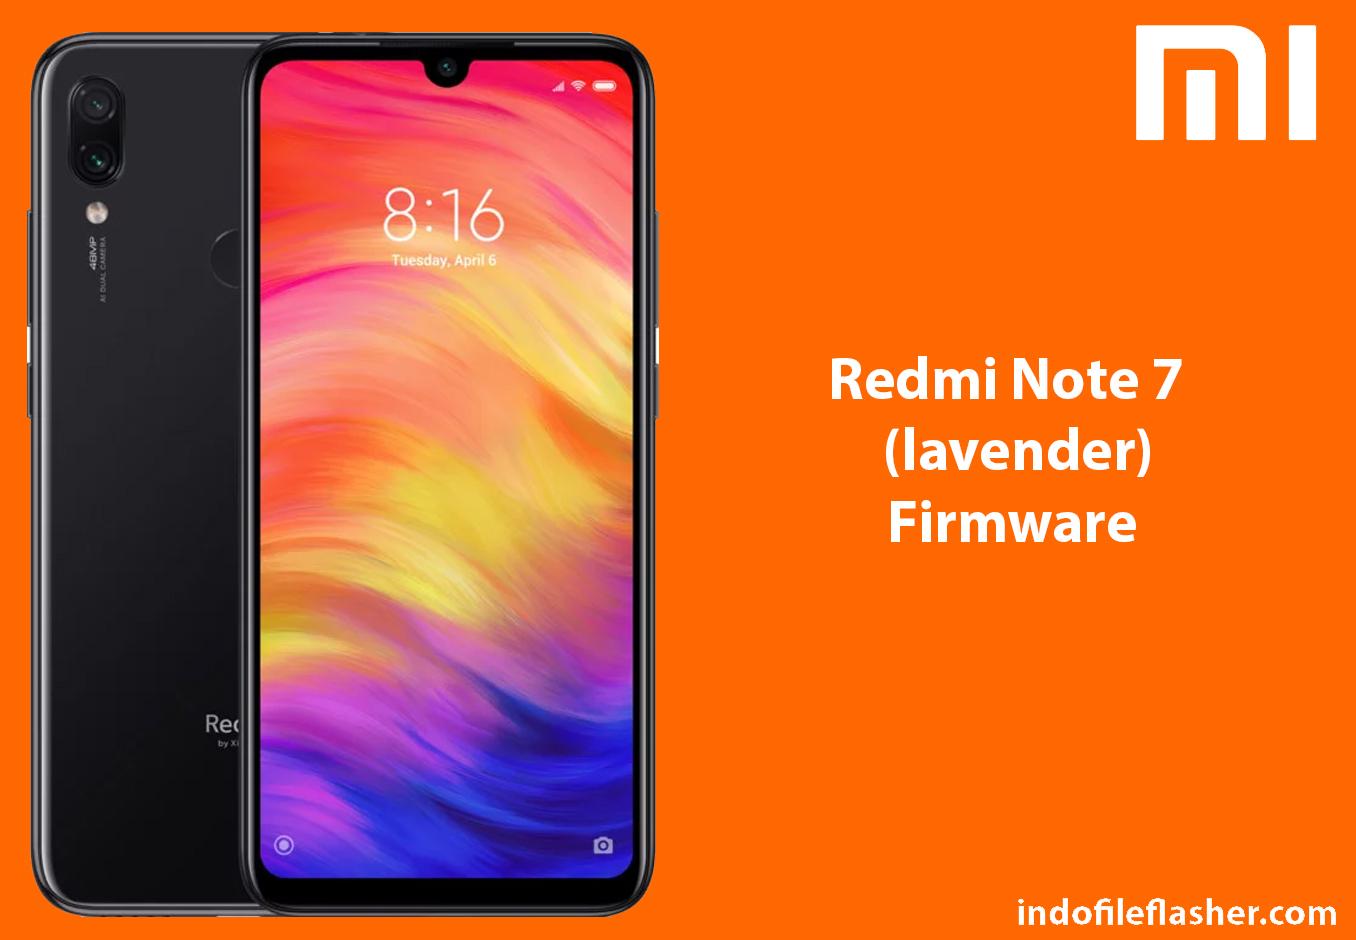 Firmware Xiaomi Redmi Note 7 lavender (V10 2 7 0 PFGINXM